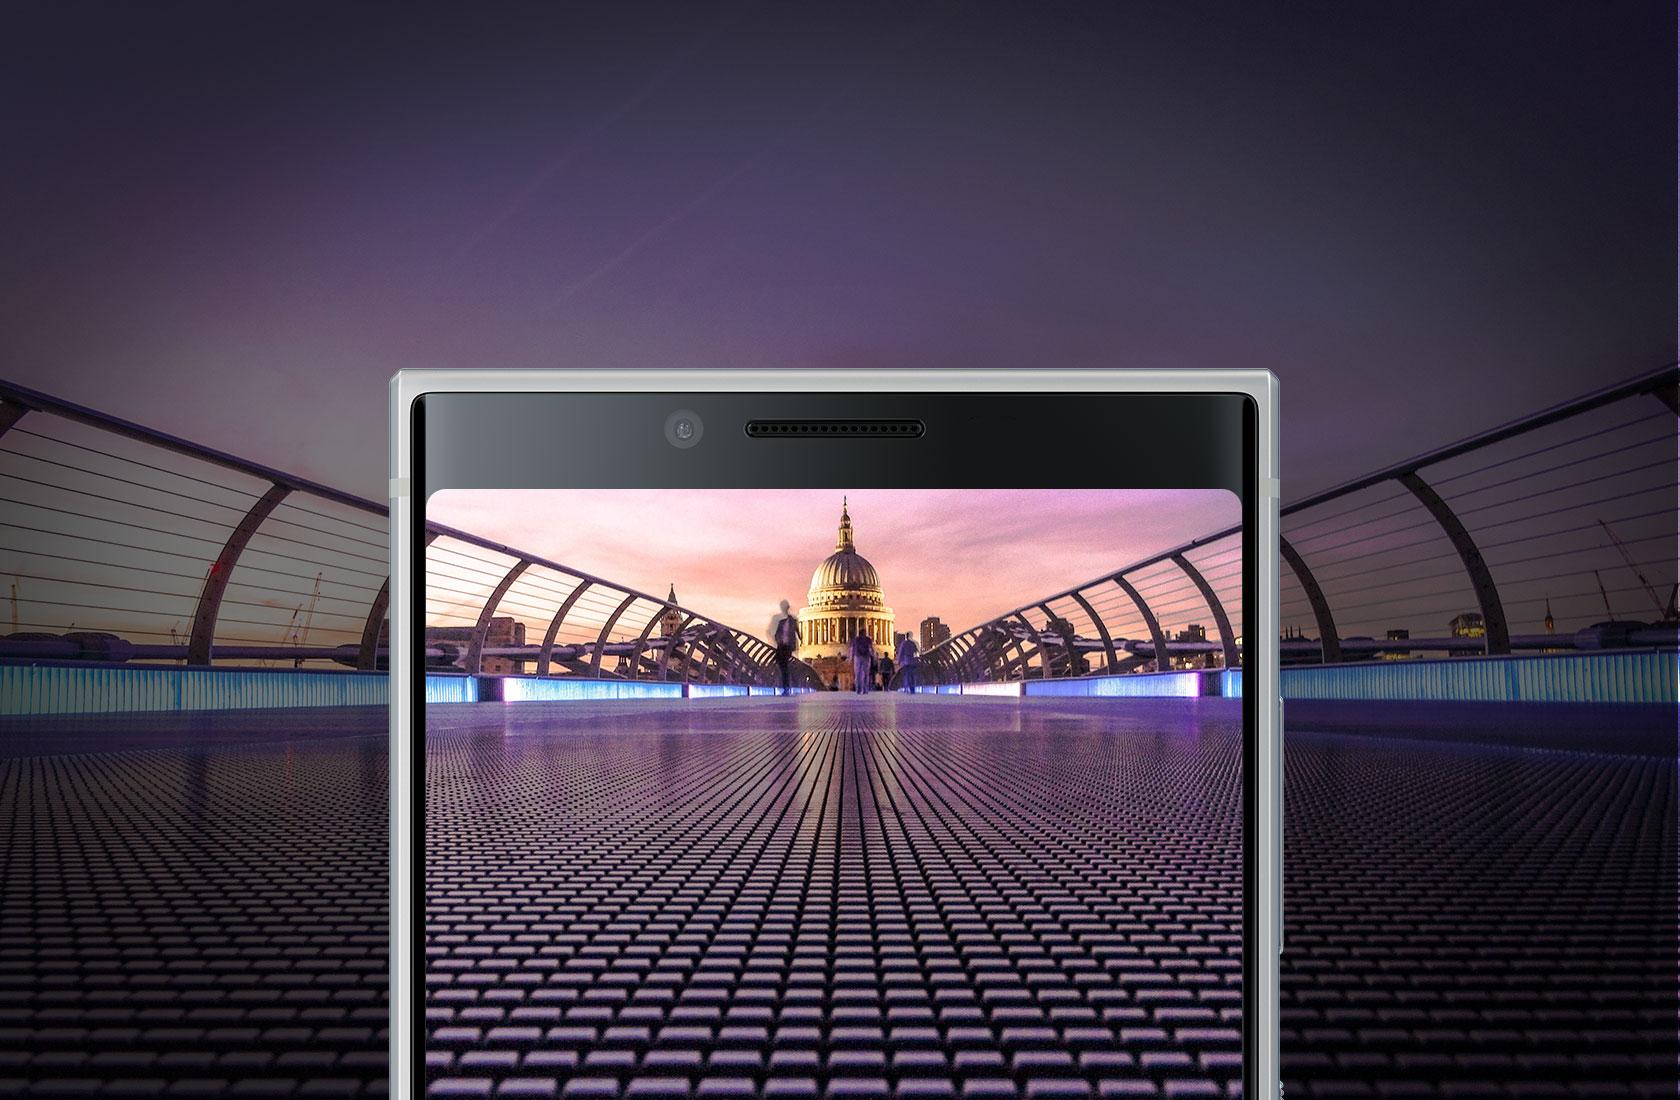 camera2 - BlackBerry KEY2